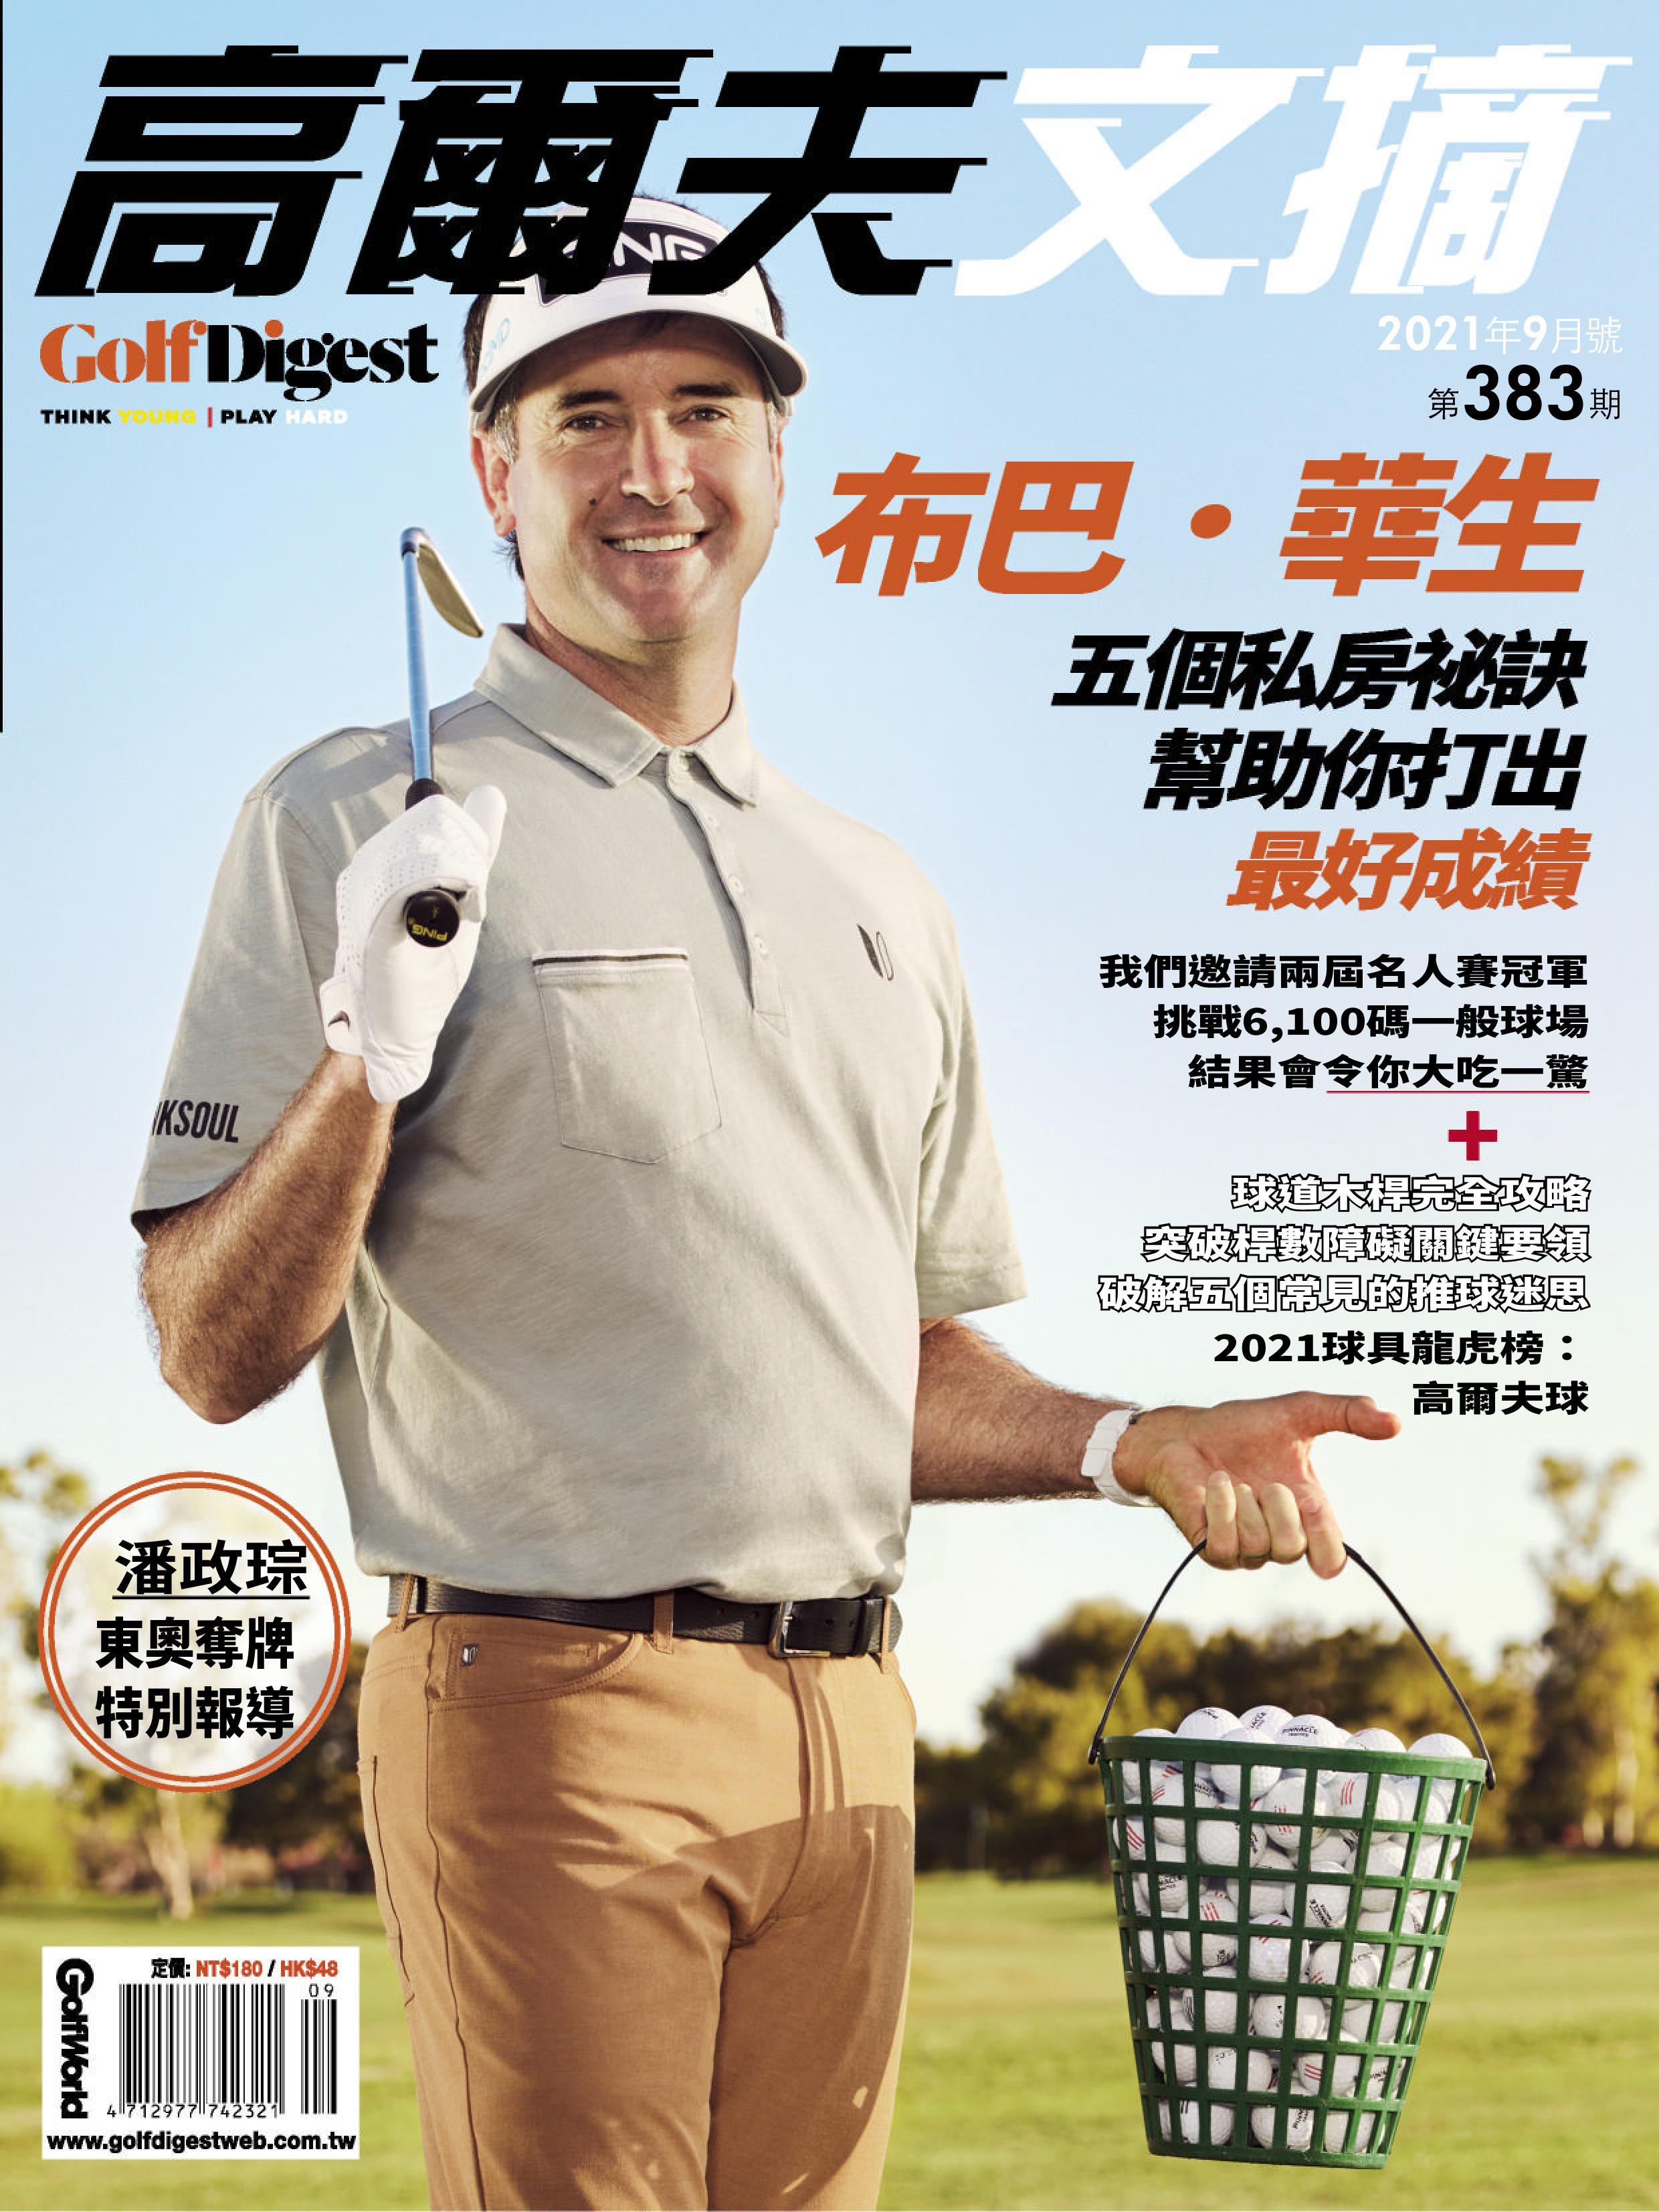 Golf Digest Taiwan 高爾夫文摘 - 九月 2021